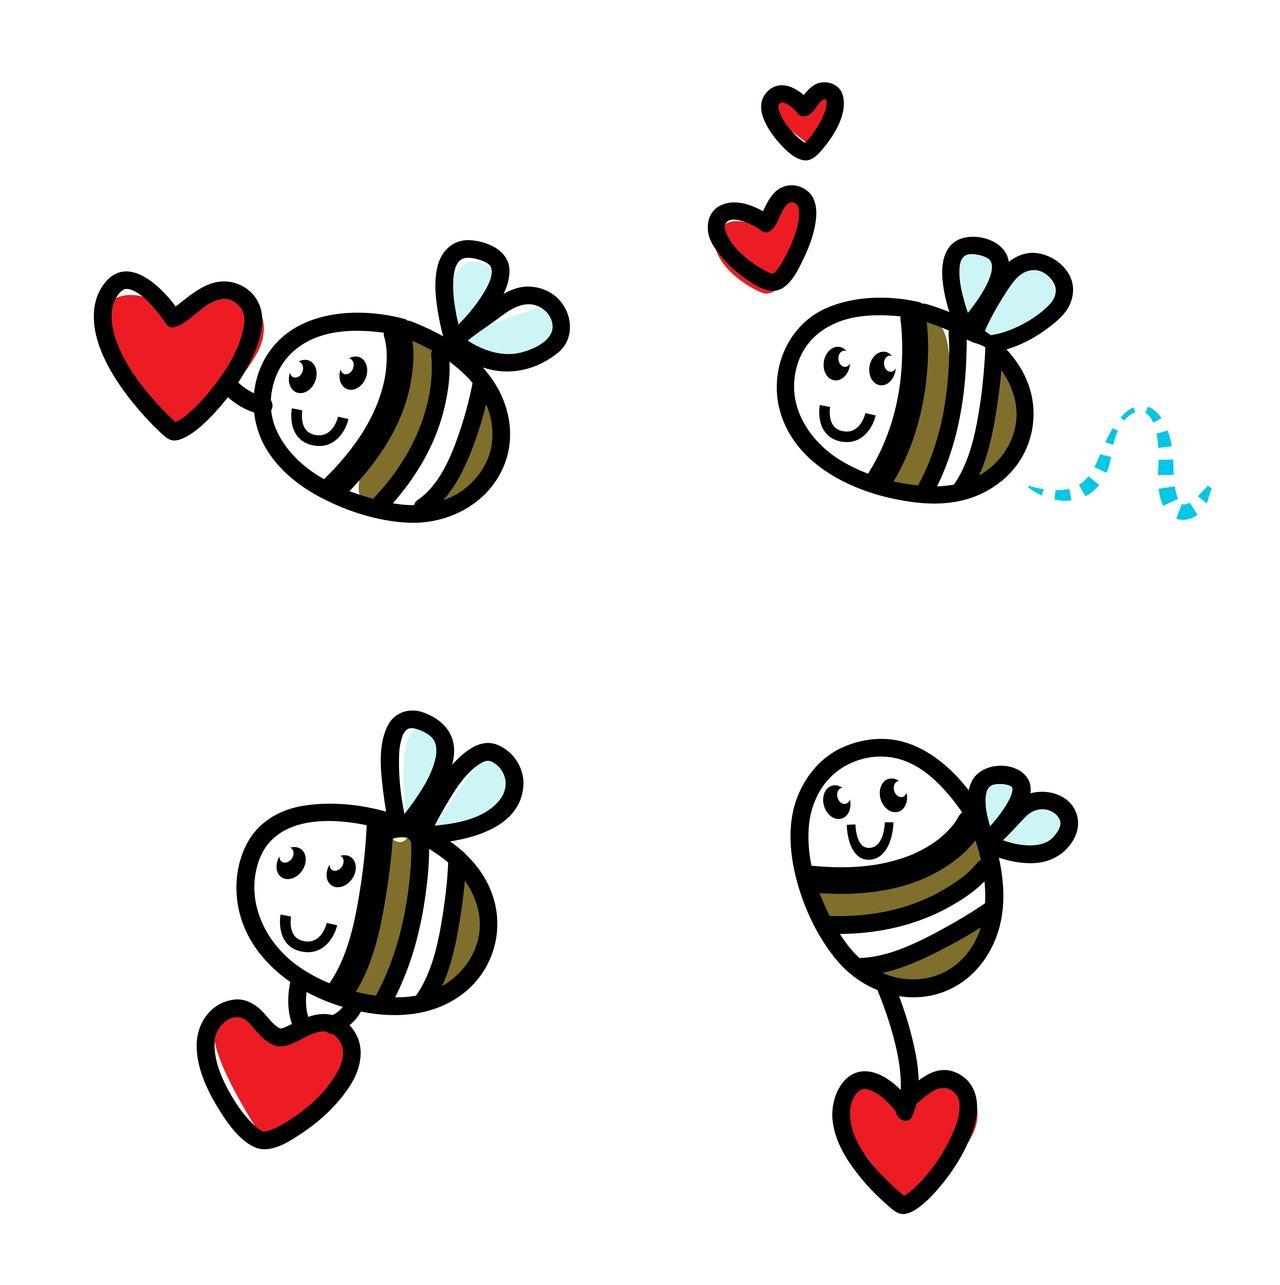 "Designers ""lady vintage Bees"" : Art for valentine Artforsale ArtShop Characterdesign Cute Dreaming Hearts LINE Lineart Little Littlebees Love No People Shop Symbol Symbol, Shape"